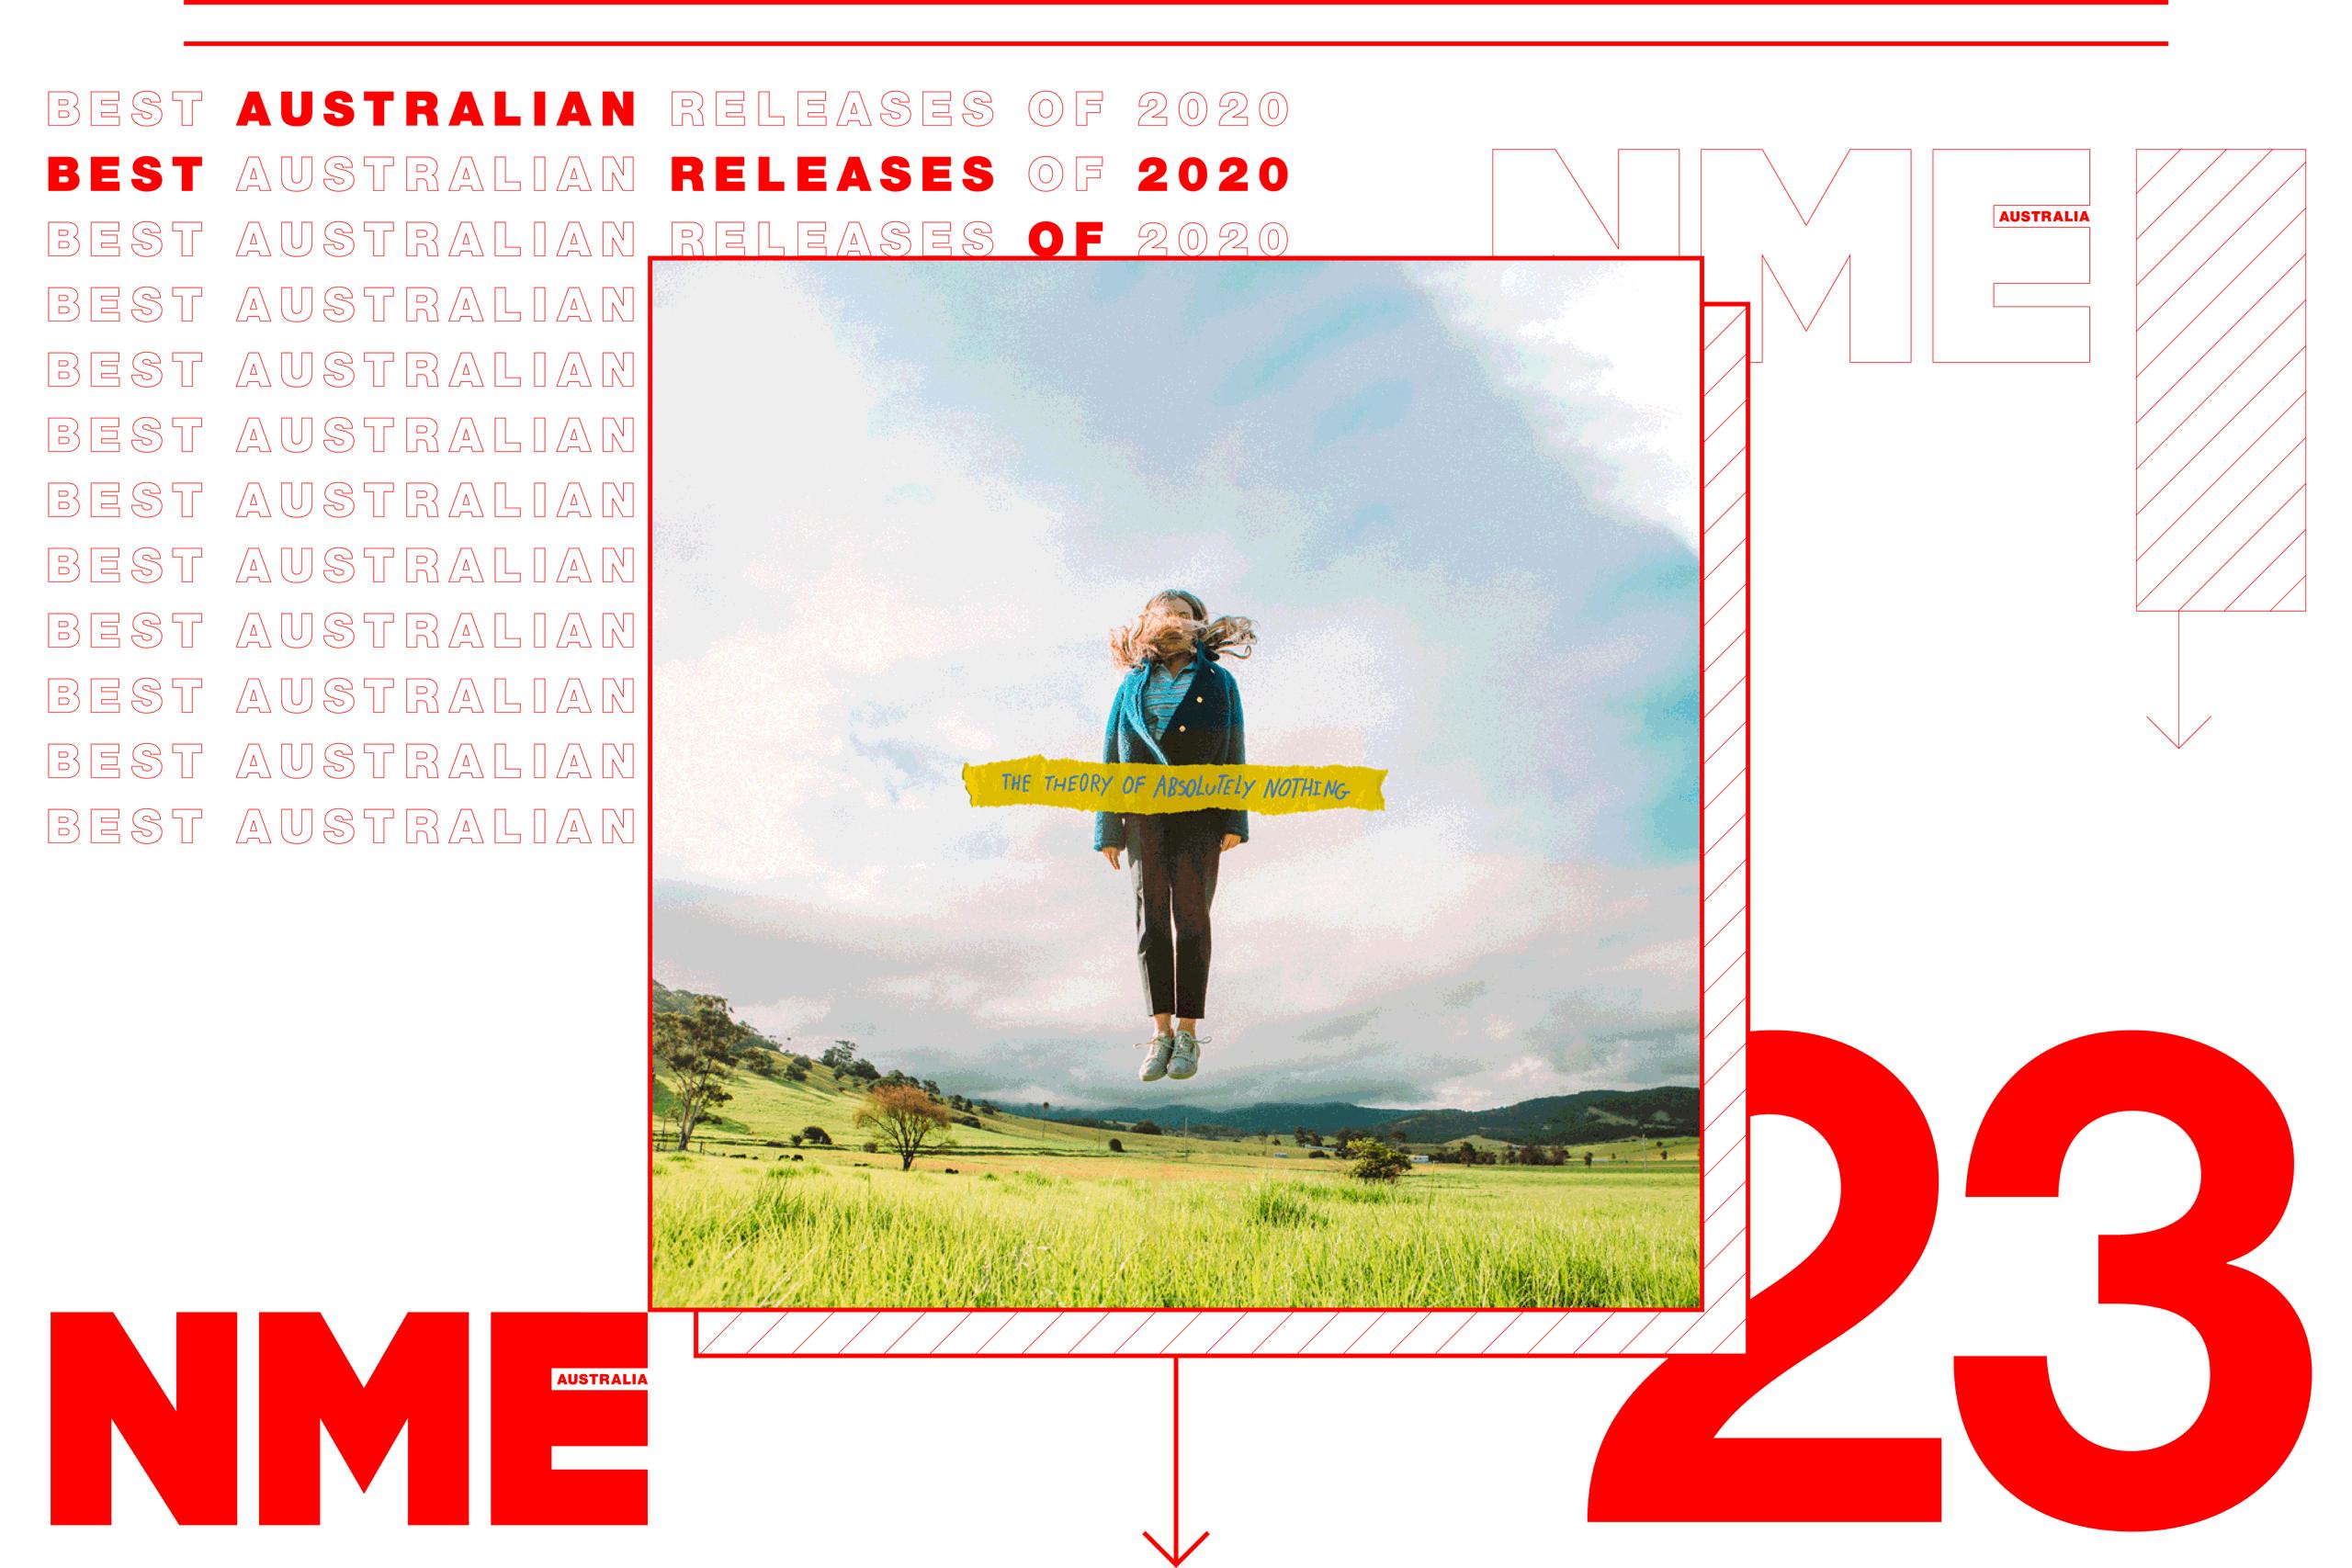 NME Australian Album Release 23